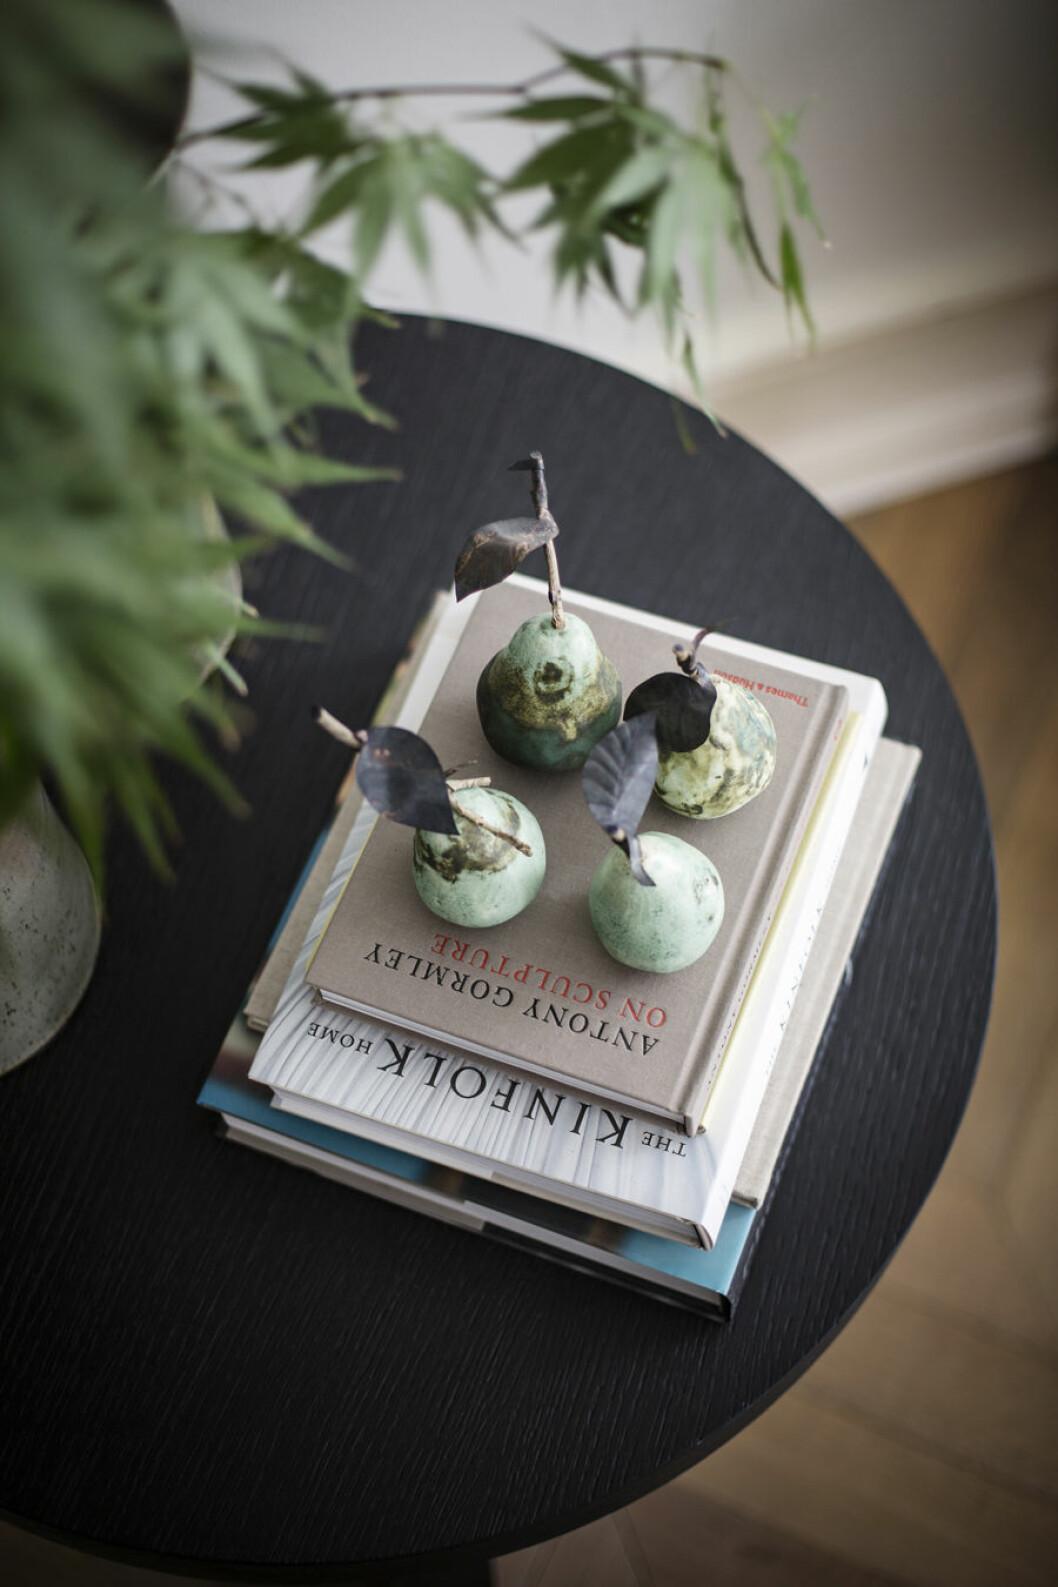 Dekoration päron, prydnadspäron